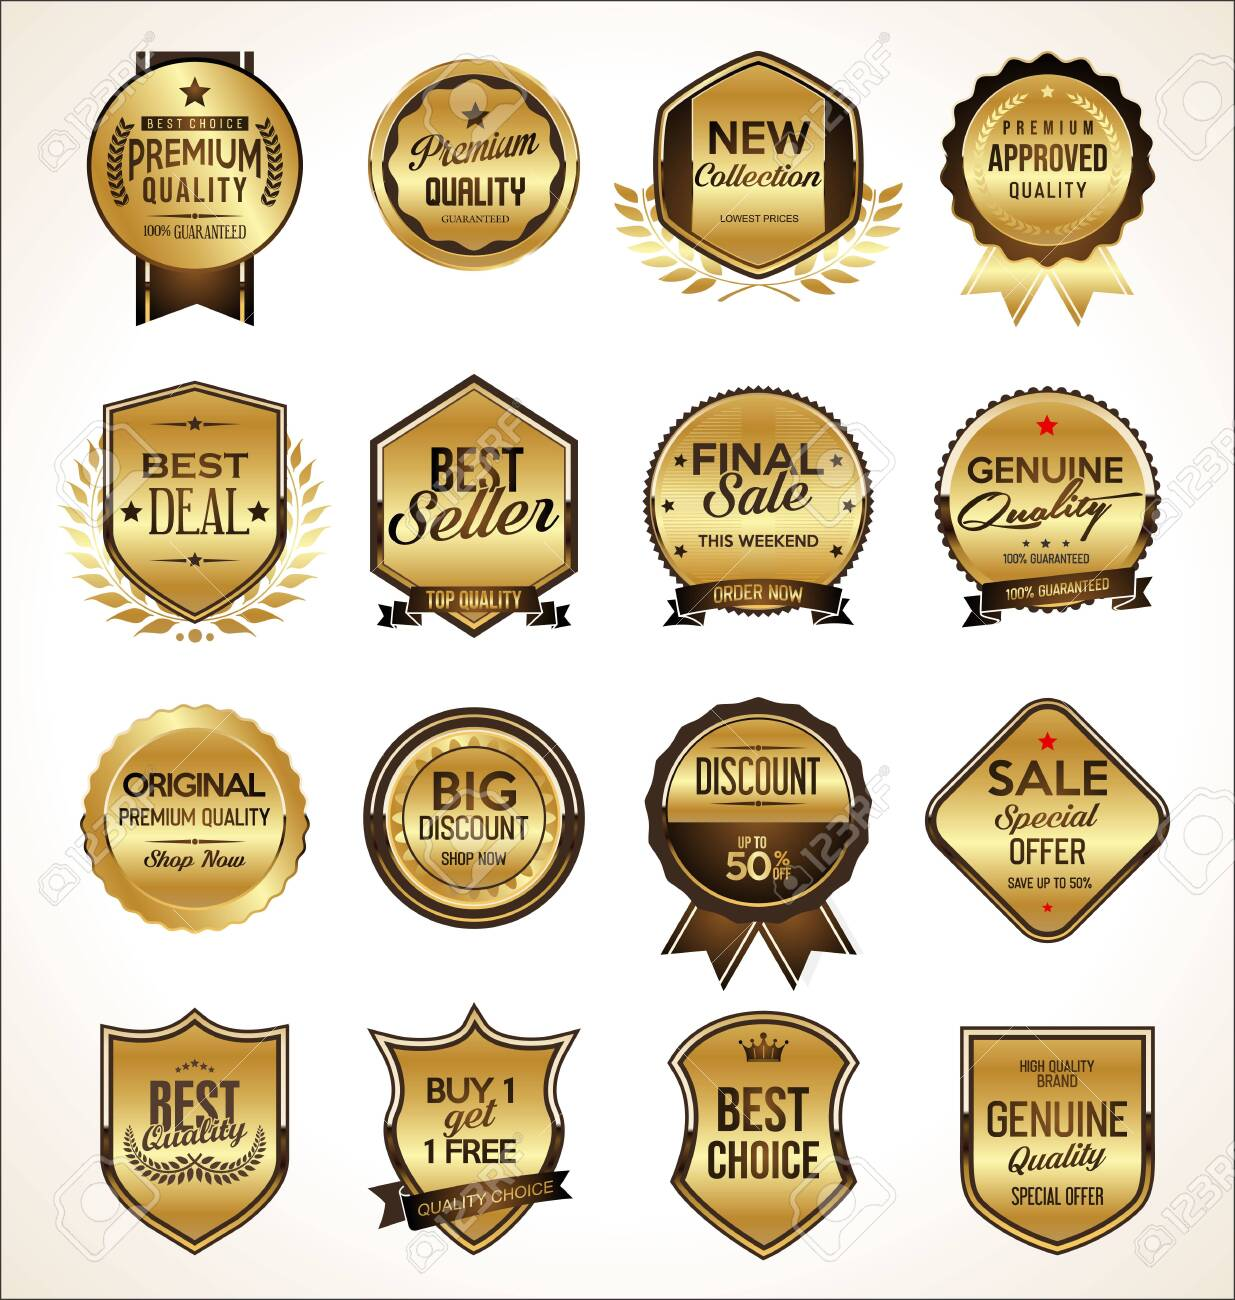 Luxury premium golden badges and labels - 134755383